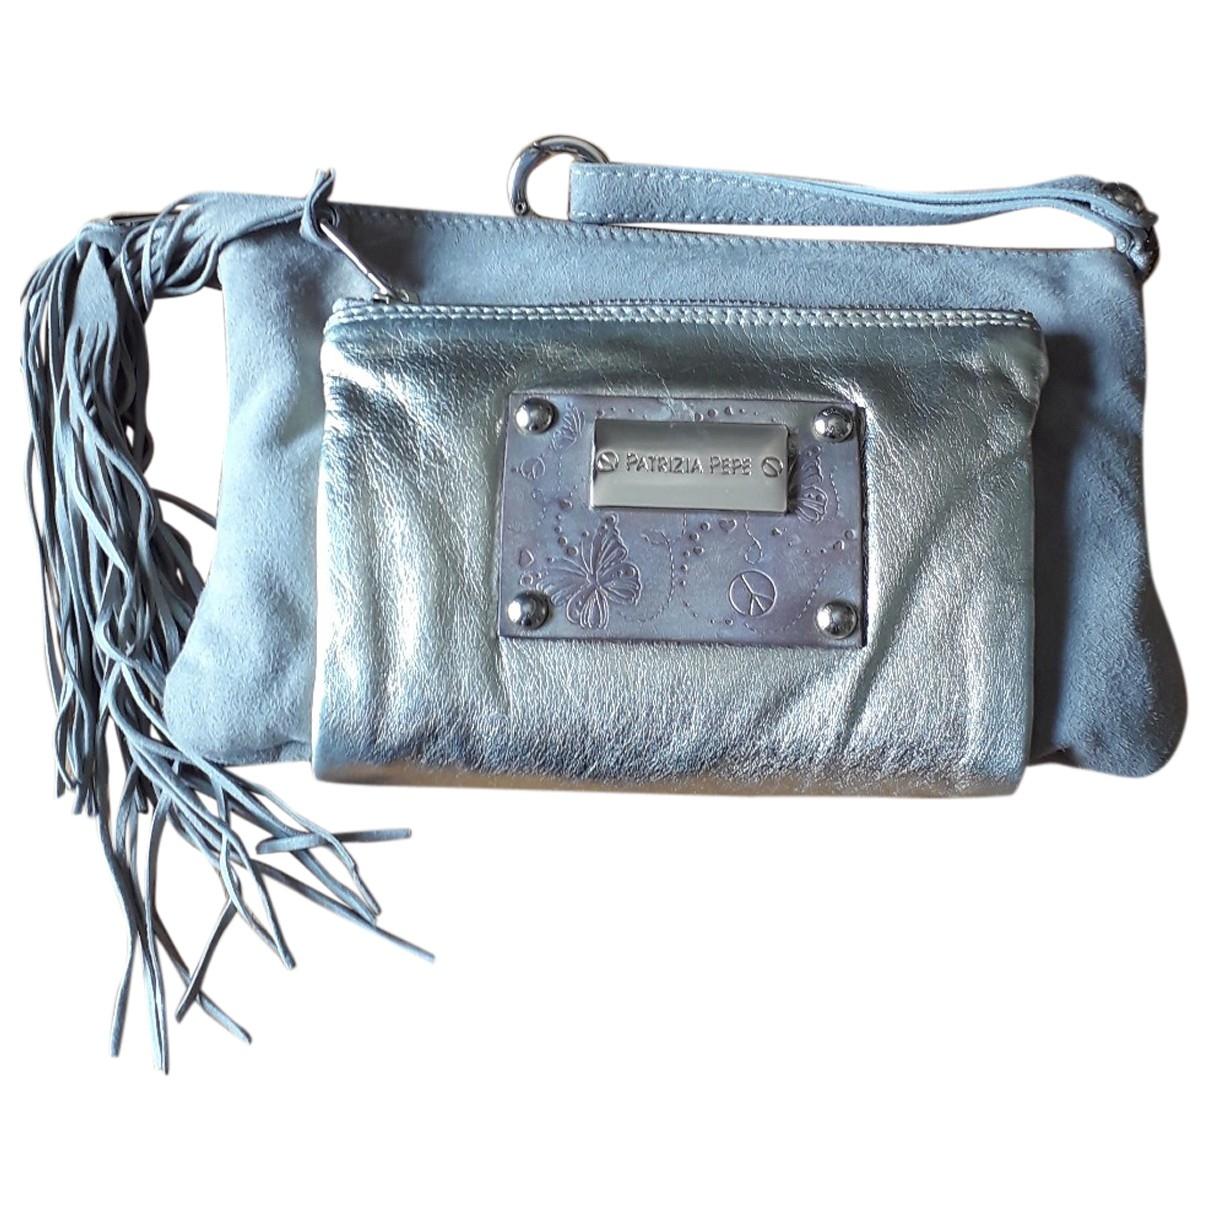 Patrizia Pepe \N Beige Suede Clutch bag for Women \N